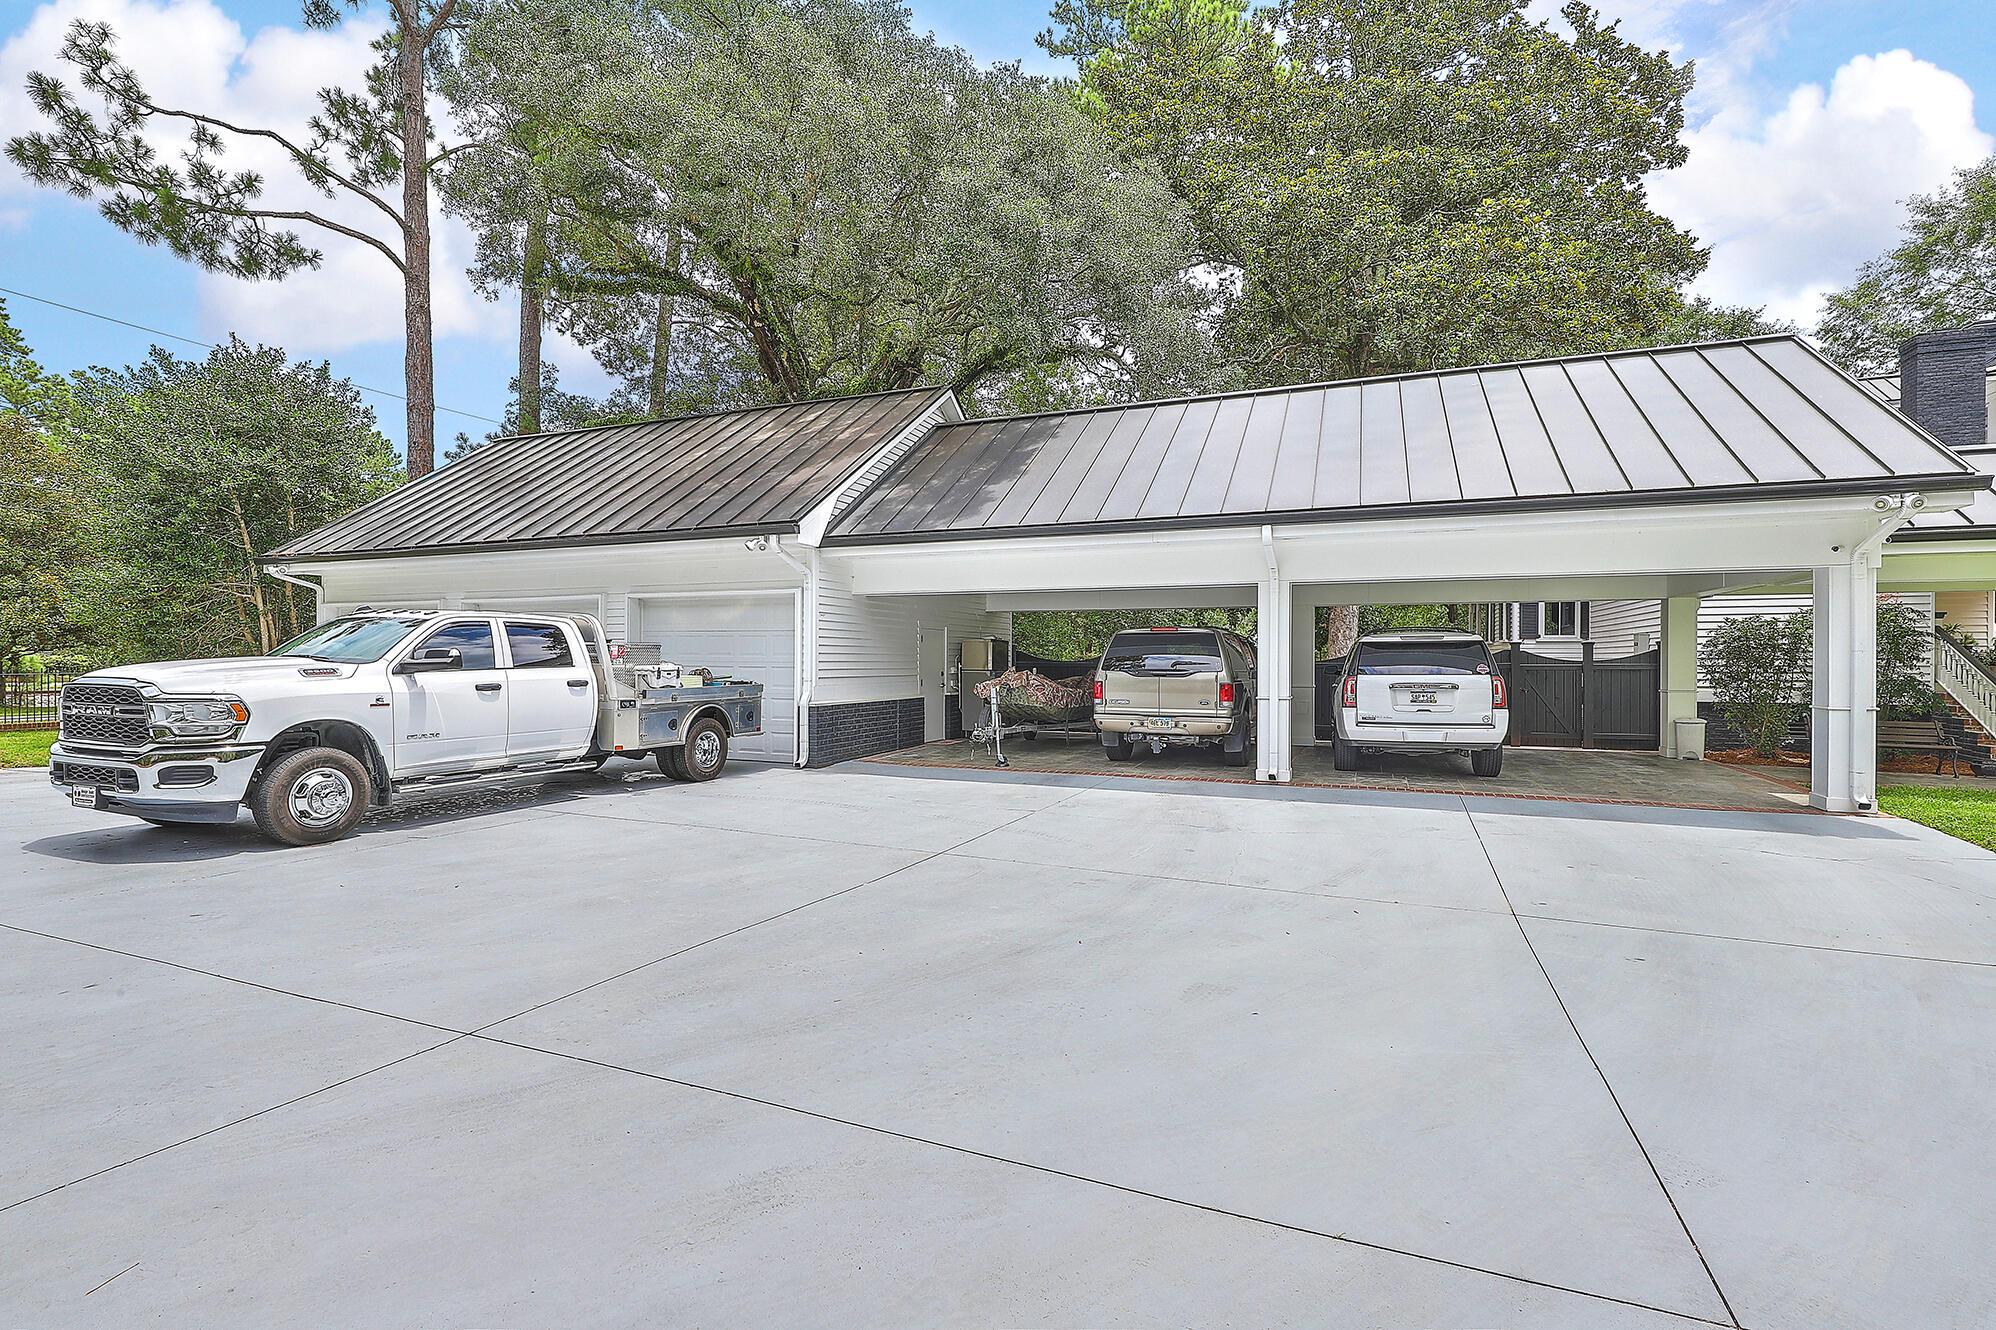 Summerville Homes For Sale - 102 Hickory, Summerville, SC - 64